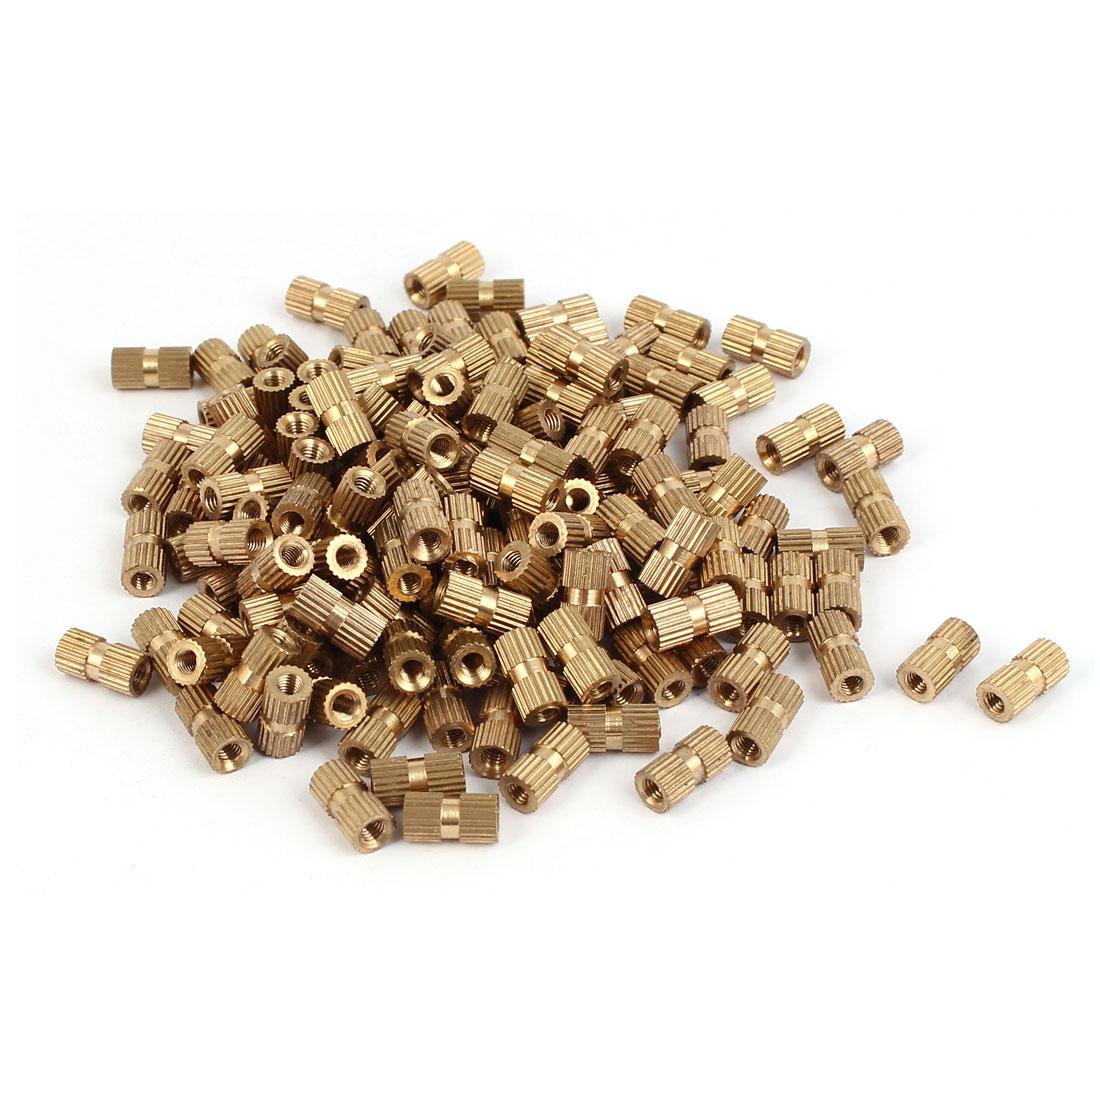 M3 x 10mm x 5.3mm Brass Knurled Threaded Round Insert Embedded Nuts 200PCS